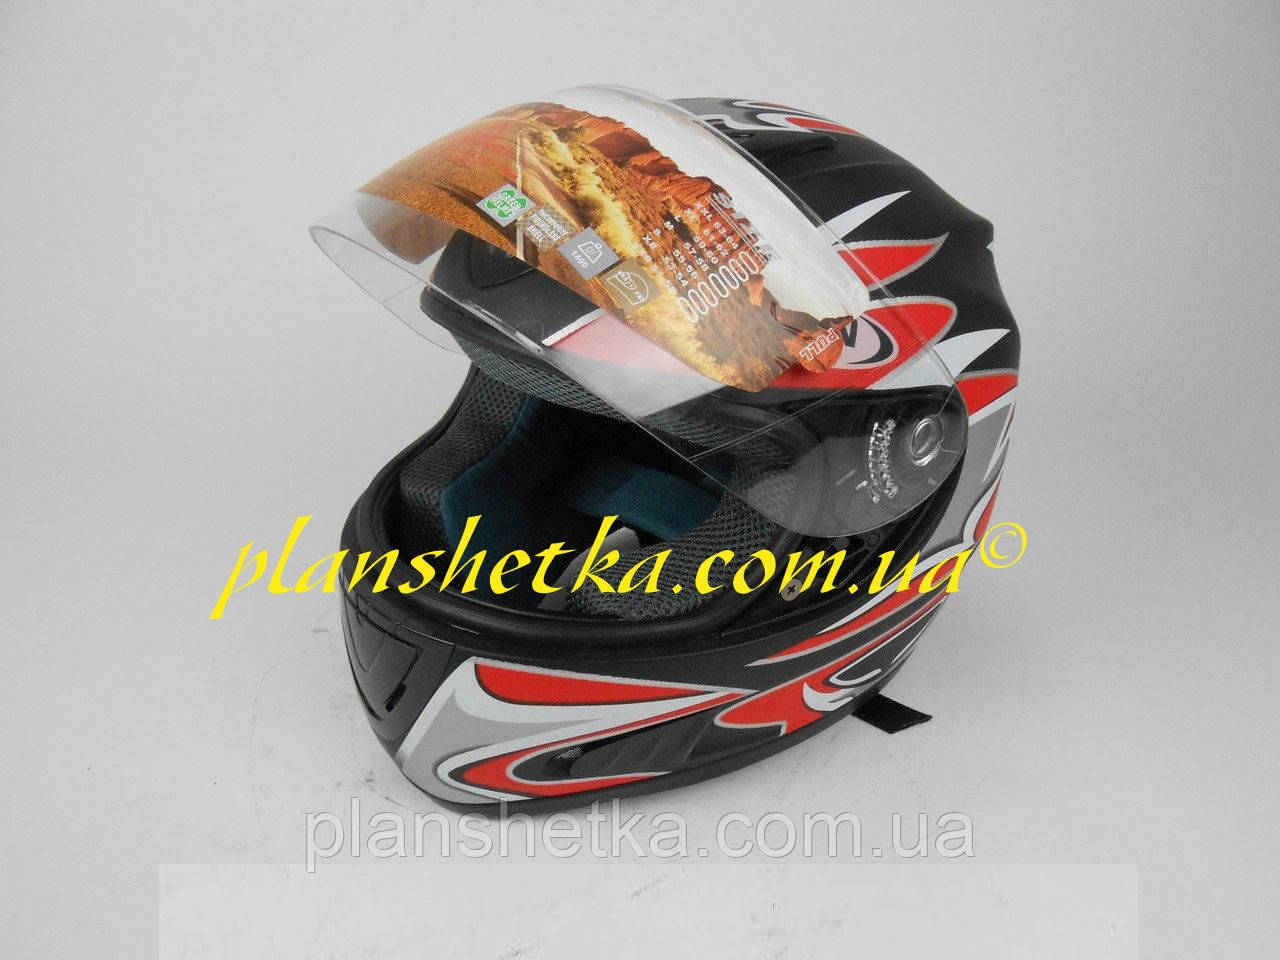 Шолом для мотоцикла Hel-Met 160 чорний мат з червоним